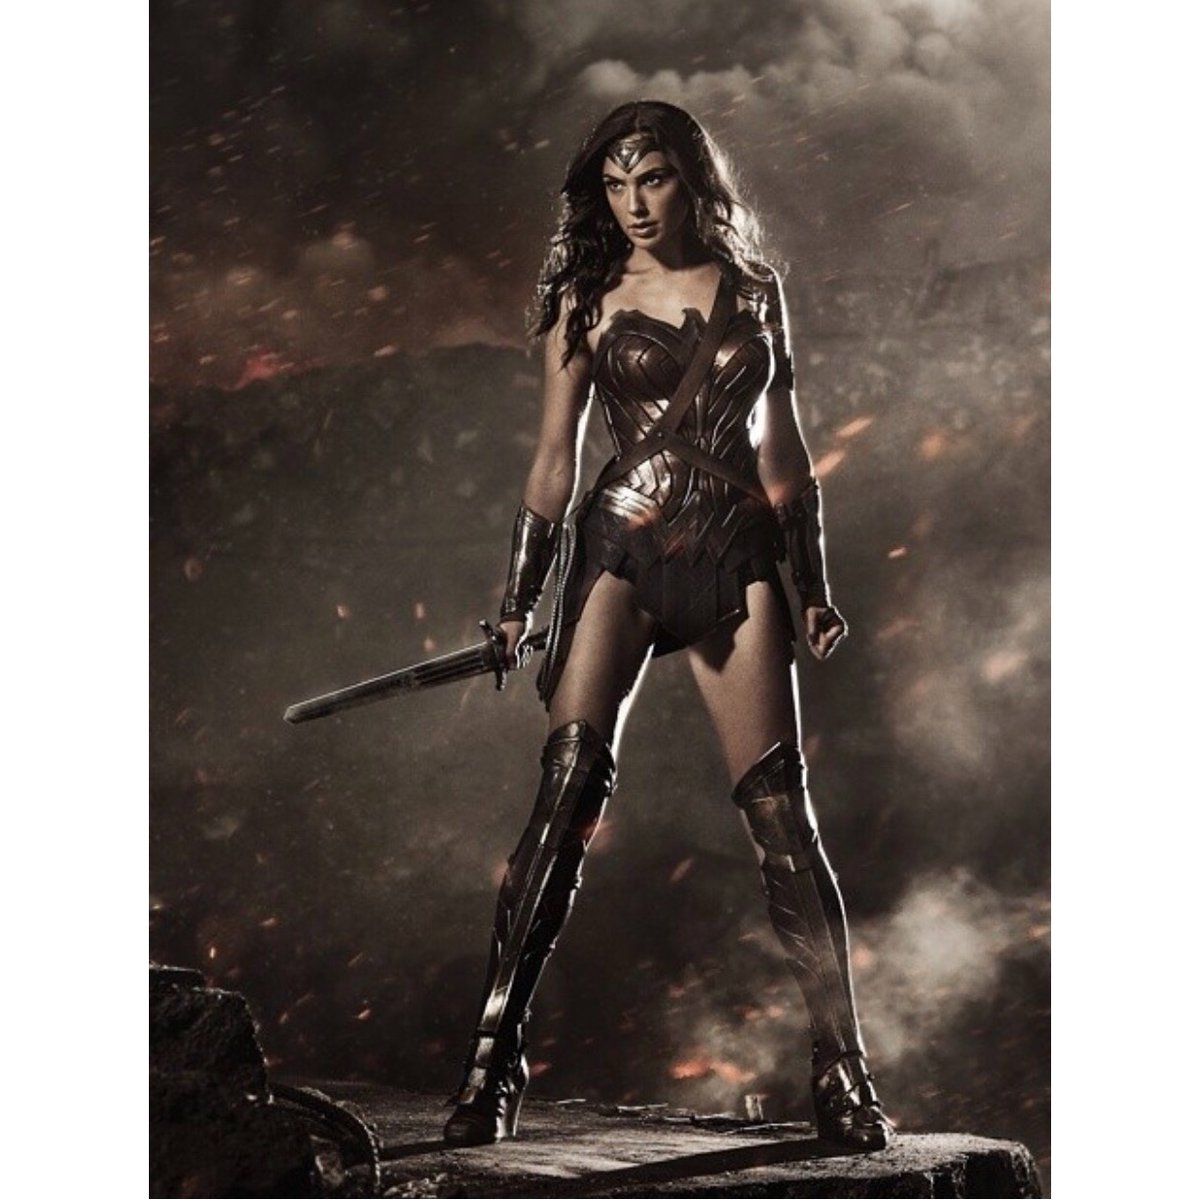 Gal Gadot como Wonder Woman en Batman v Superman: Dawn of Justice (2016). Imagen: Gal Gadot Twitter (@Gal Gadot).